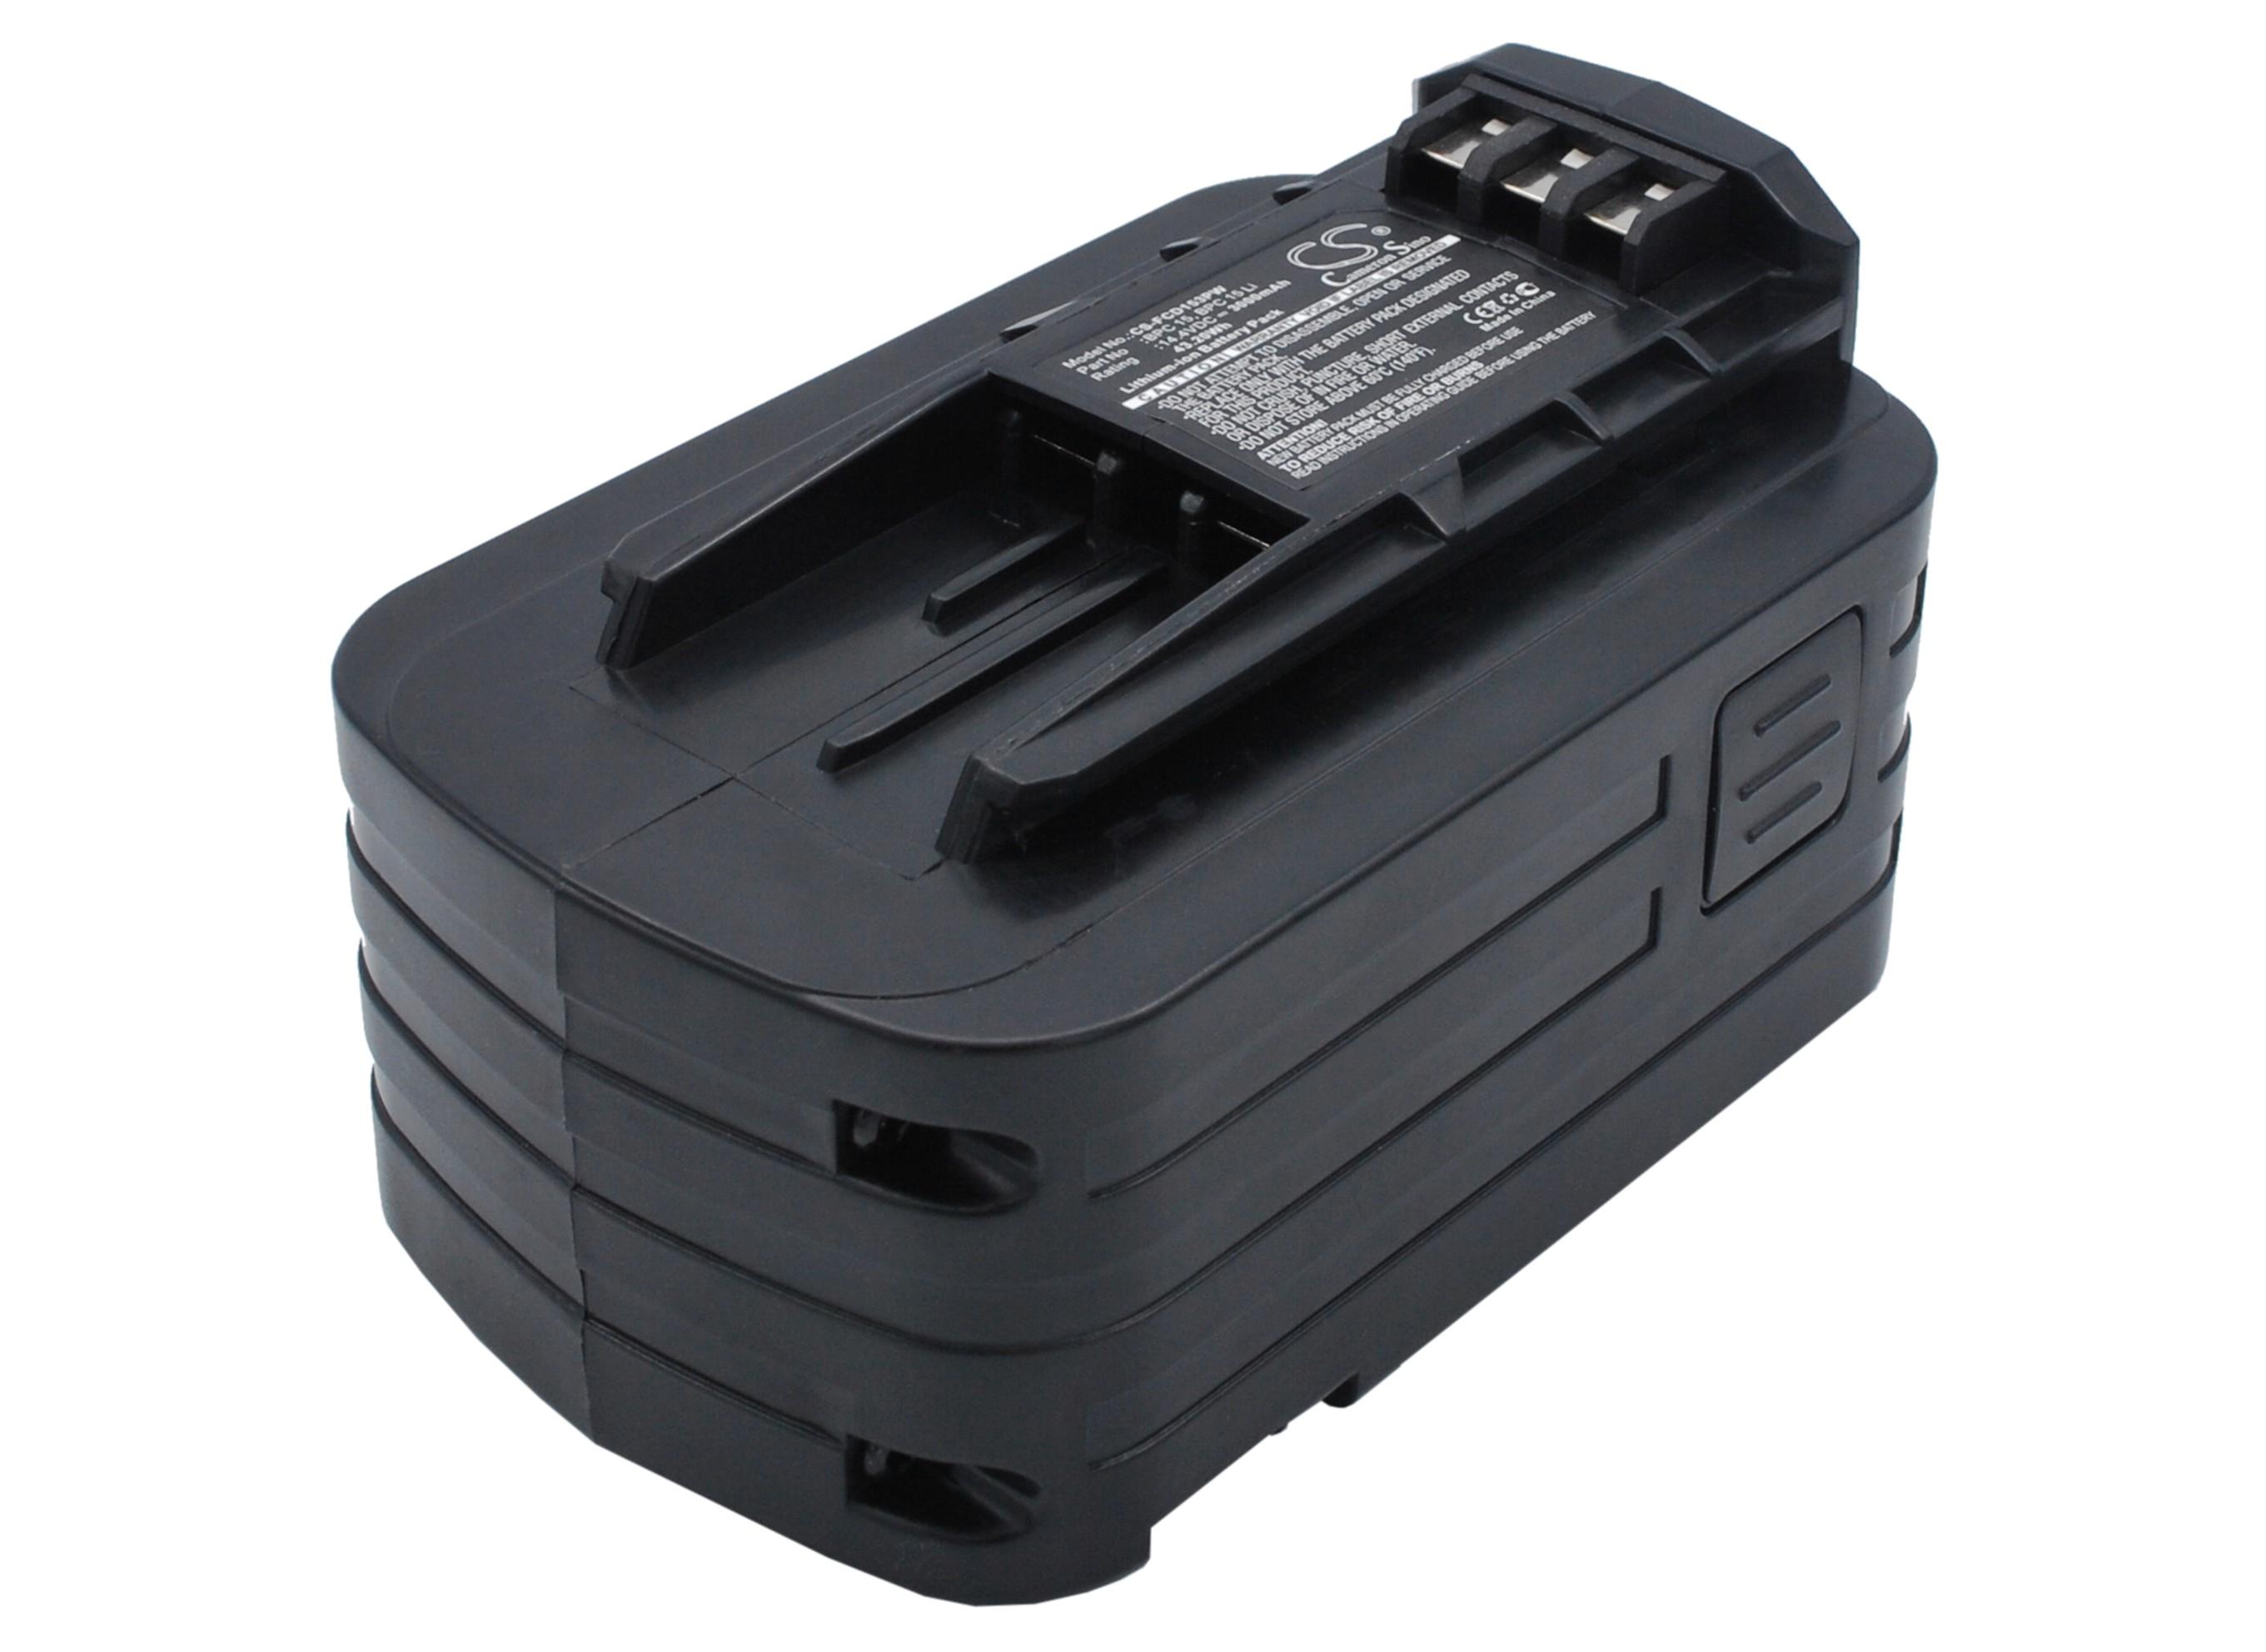 Cameron Sino baterie do nářadí pro FESTOOL DRC15 Cordless Drill/Driver 14.4V Li-ion 3000mAh černá - neoriginální